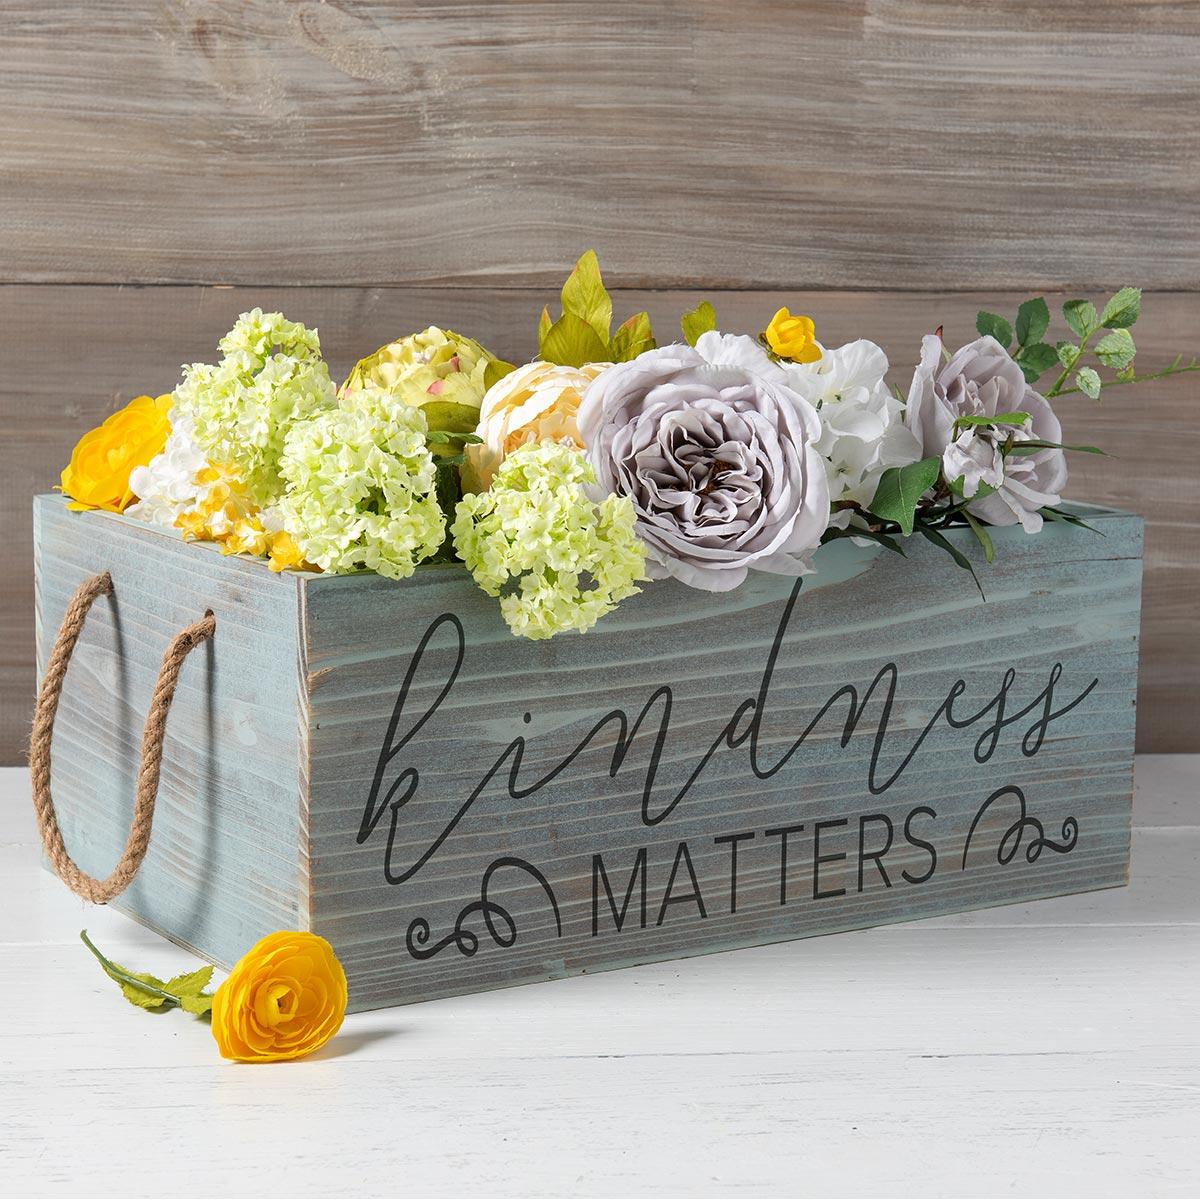 FolkArt ® Sign Shop™ Mesh Stencil - Kindness Matters - 63384